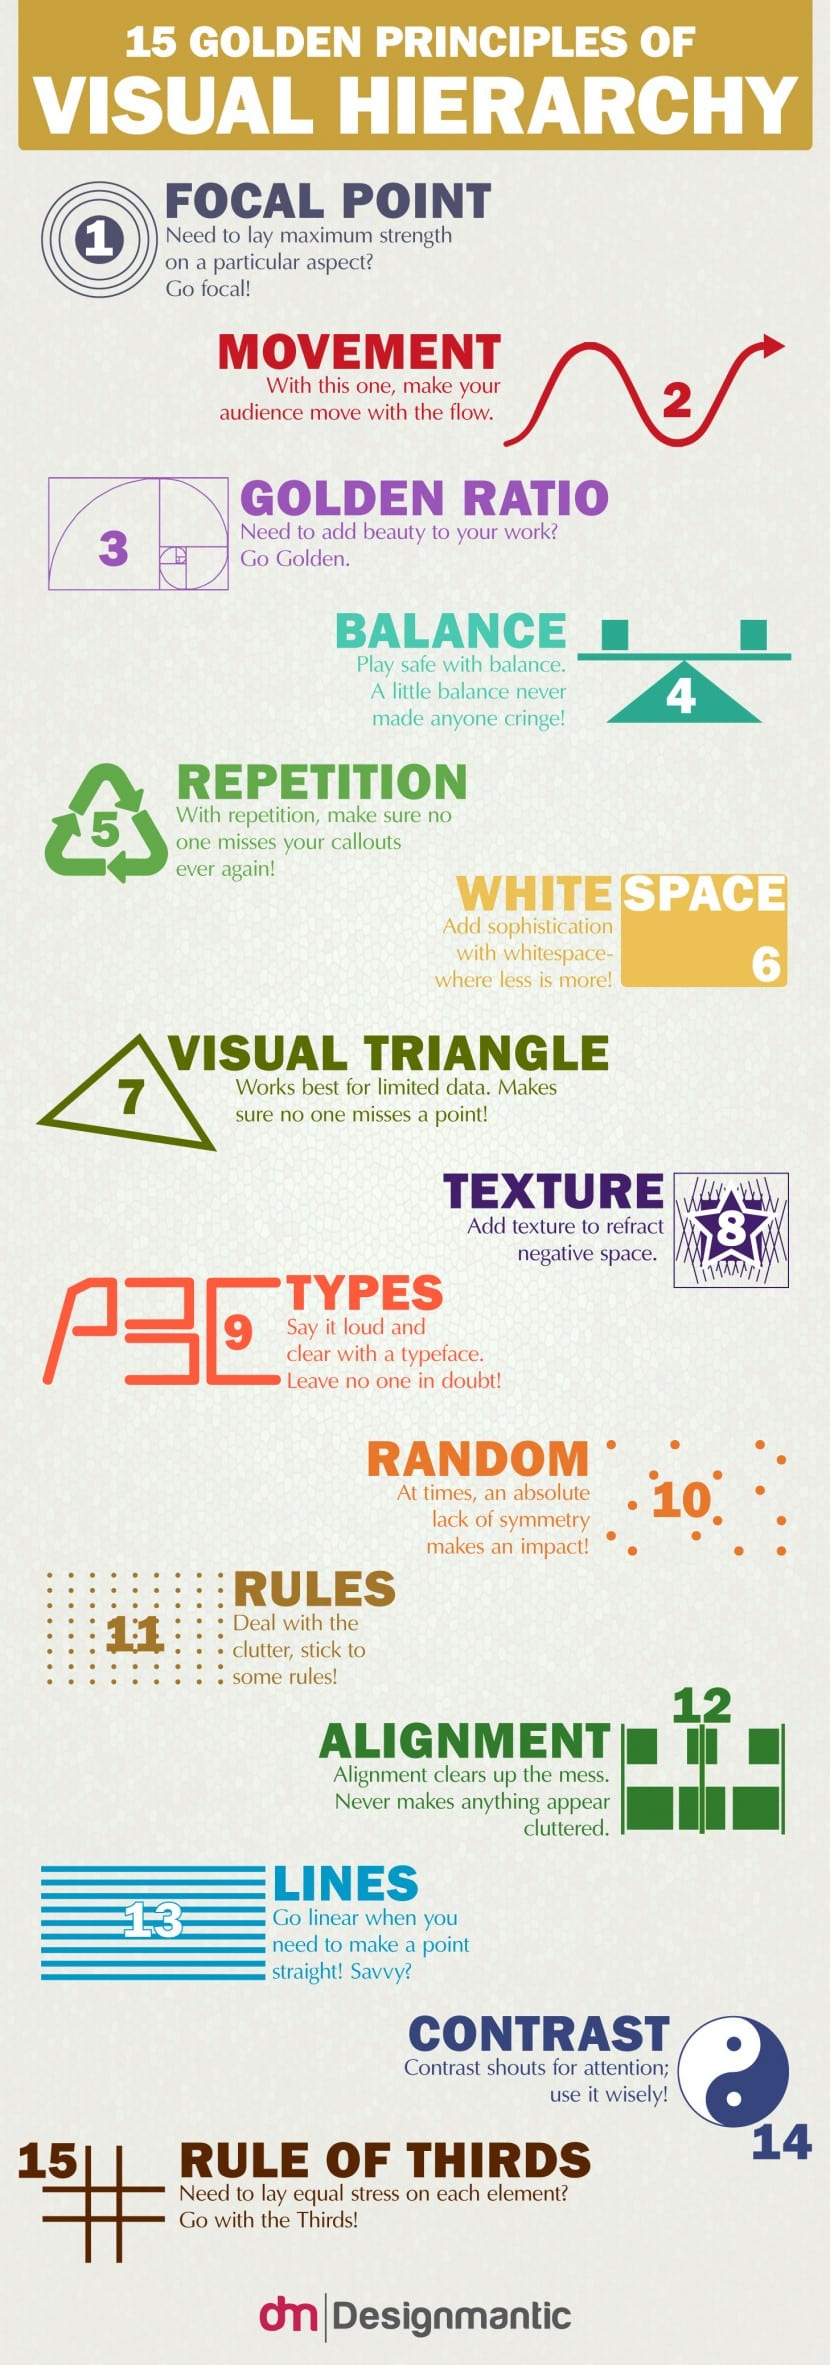 princios-jerarquia-visual2